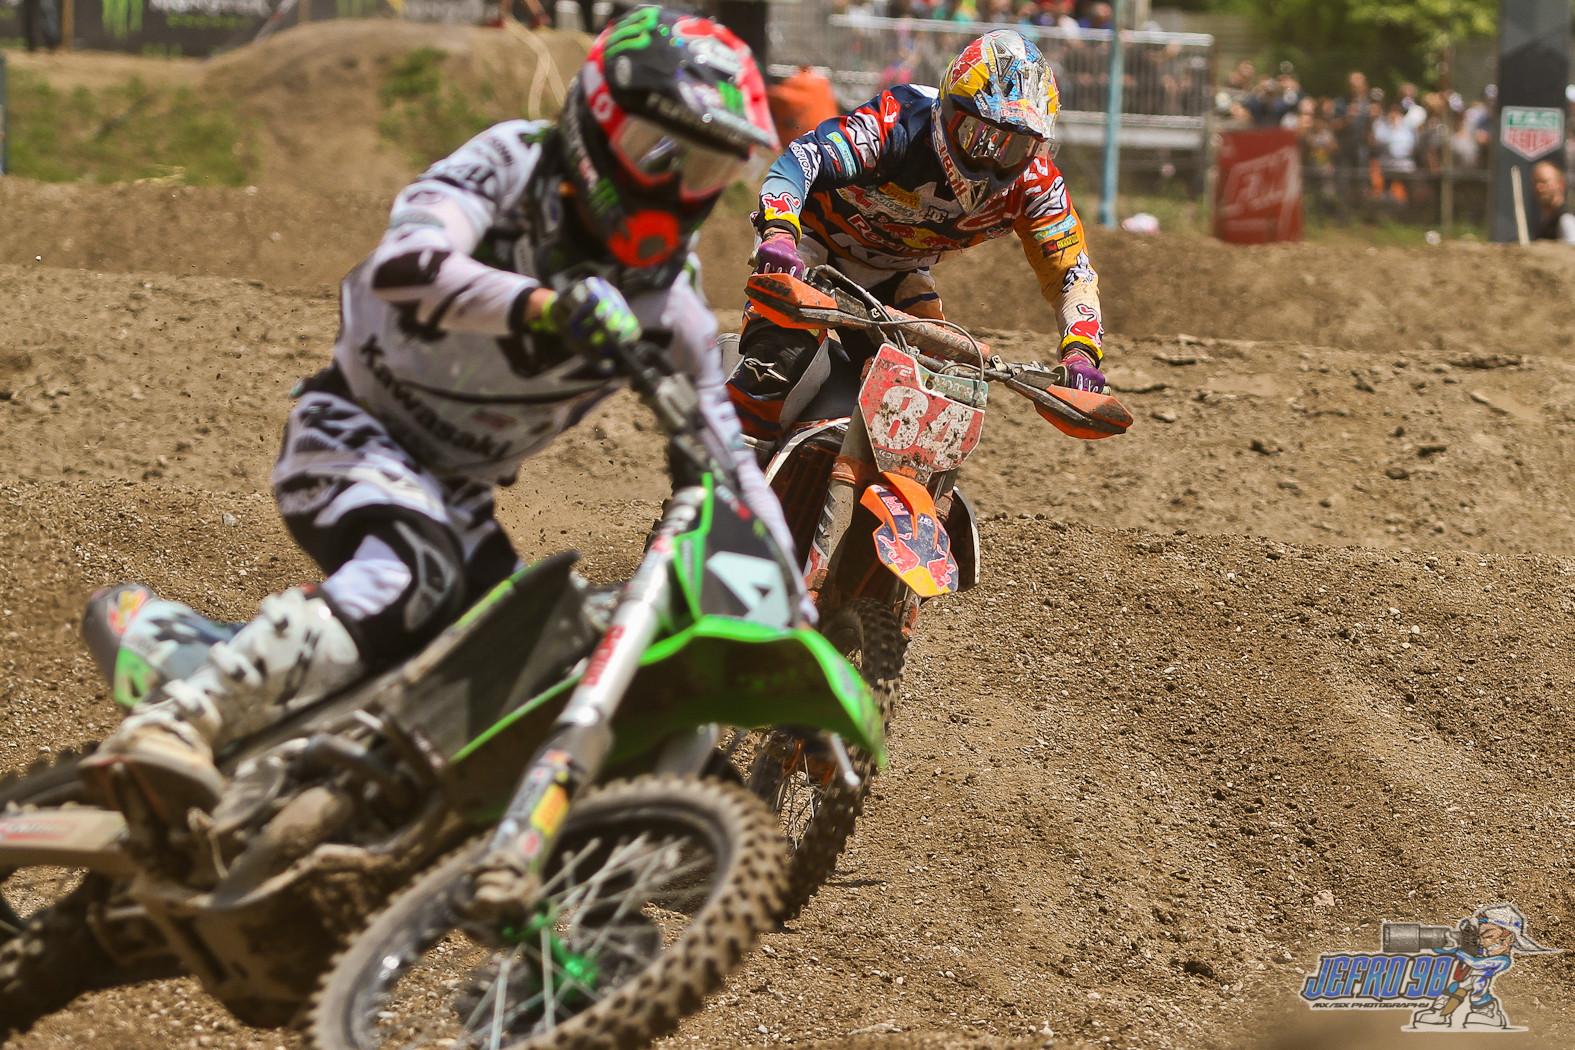 Ferrandis vs Herlings  - Photo Gallery: MXGP of Trentino, Italy - Motocross Pictures - Vital MX